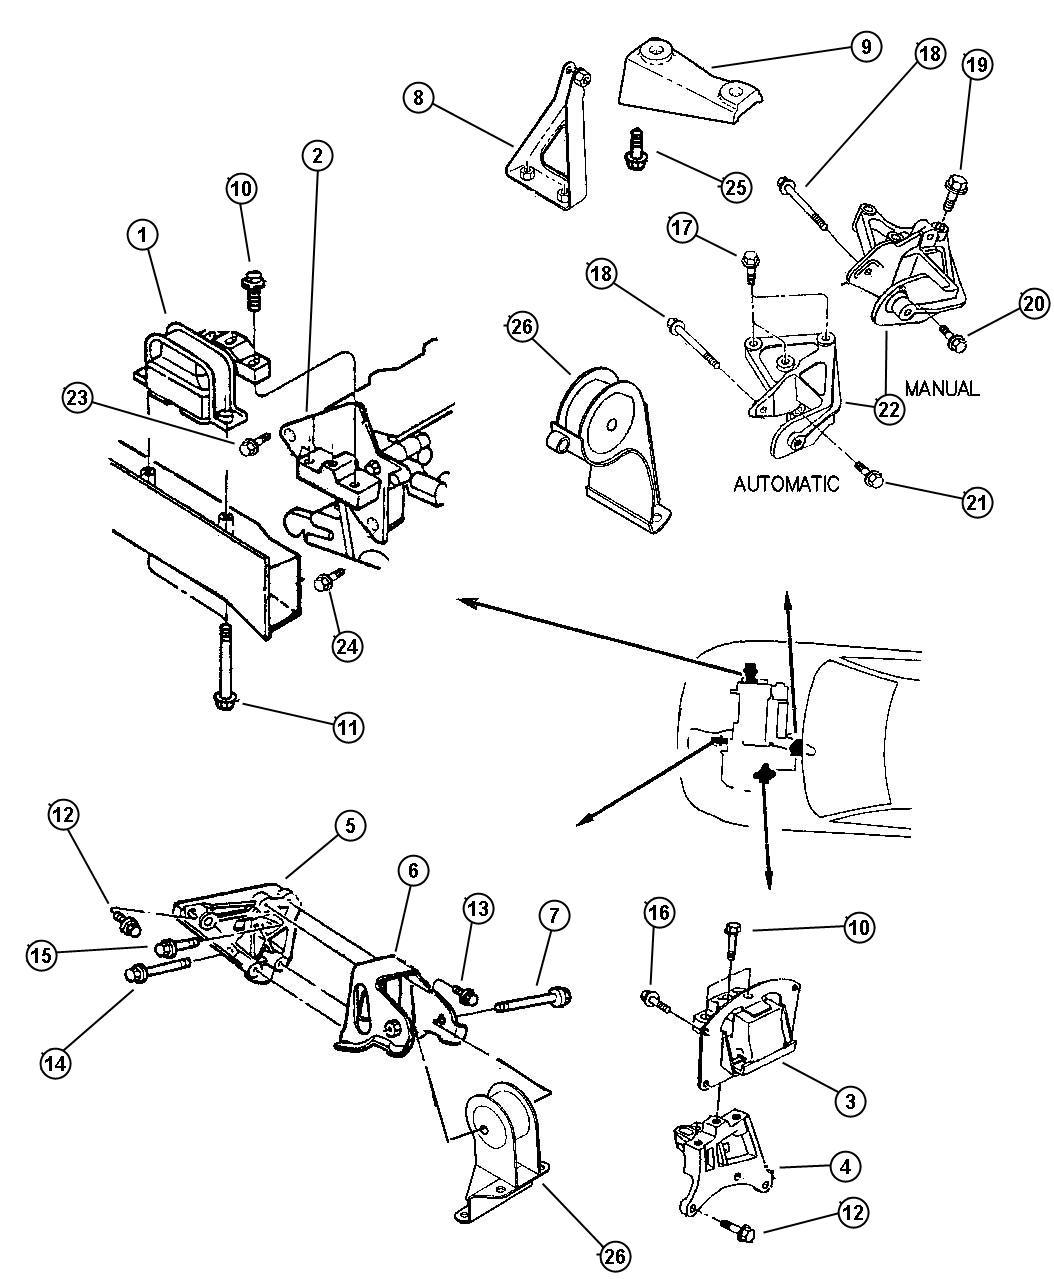 Dodge Stratus Module. Engine support. Rear. 2.0l engine